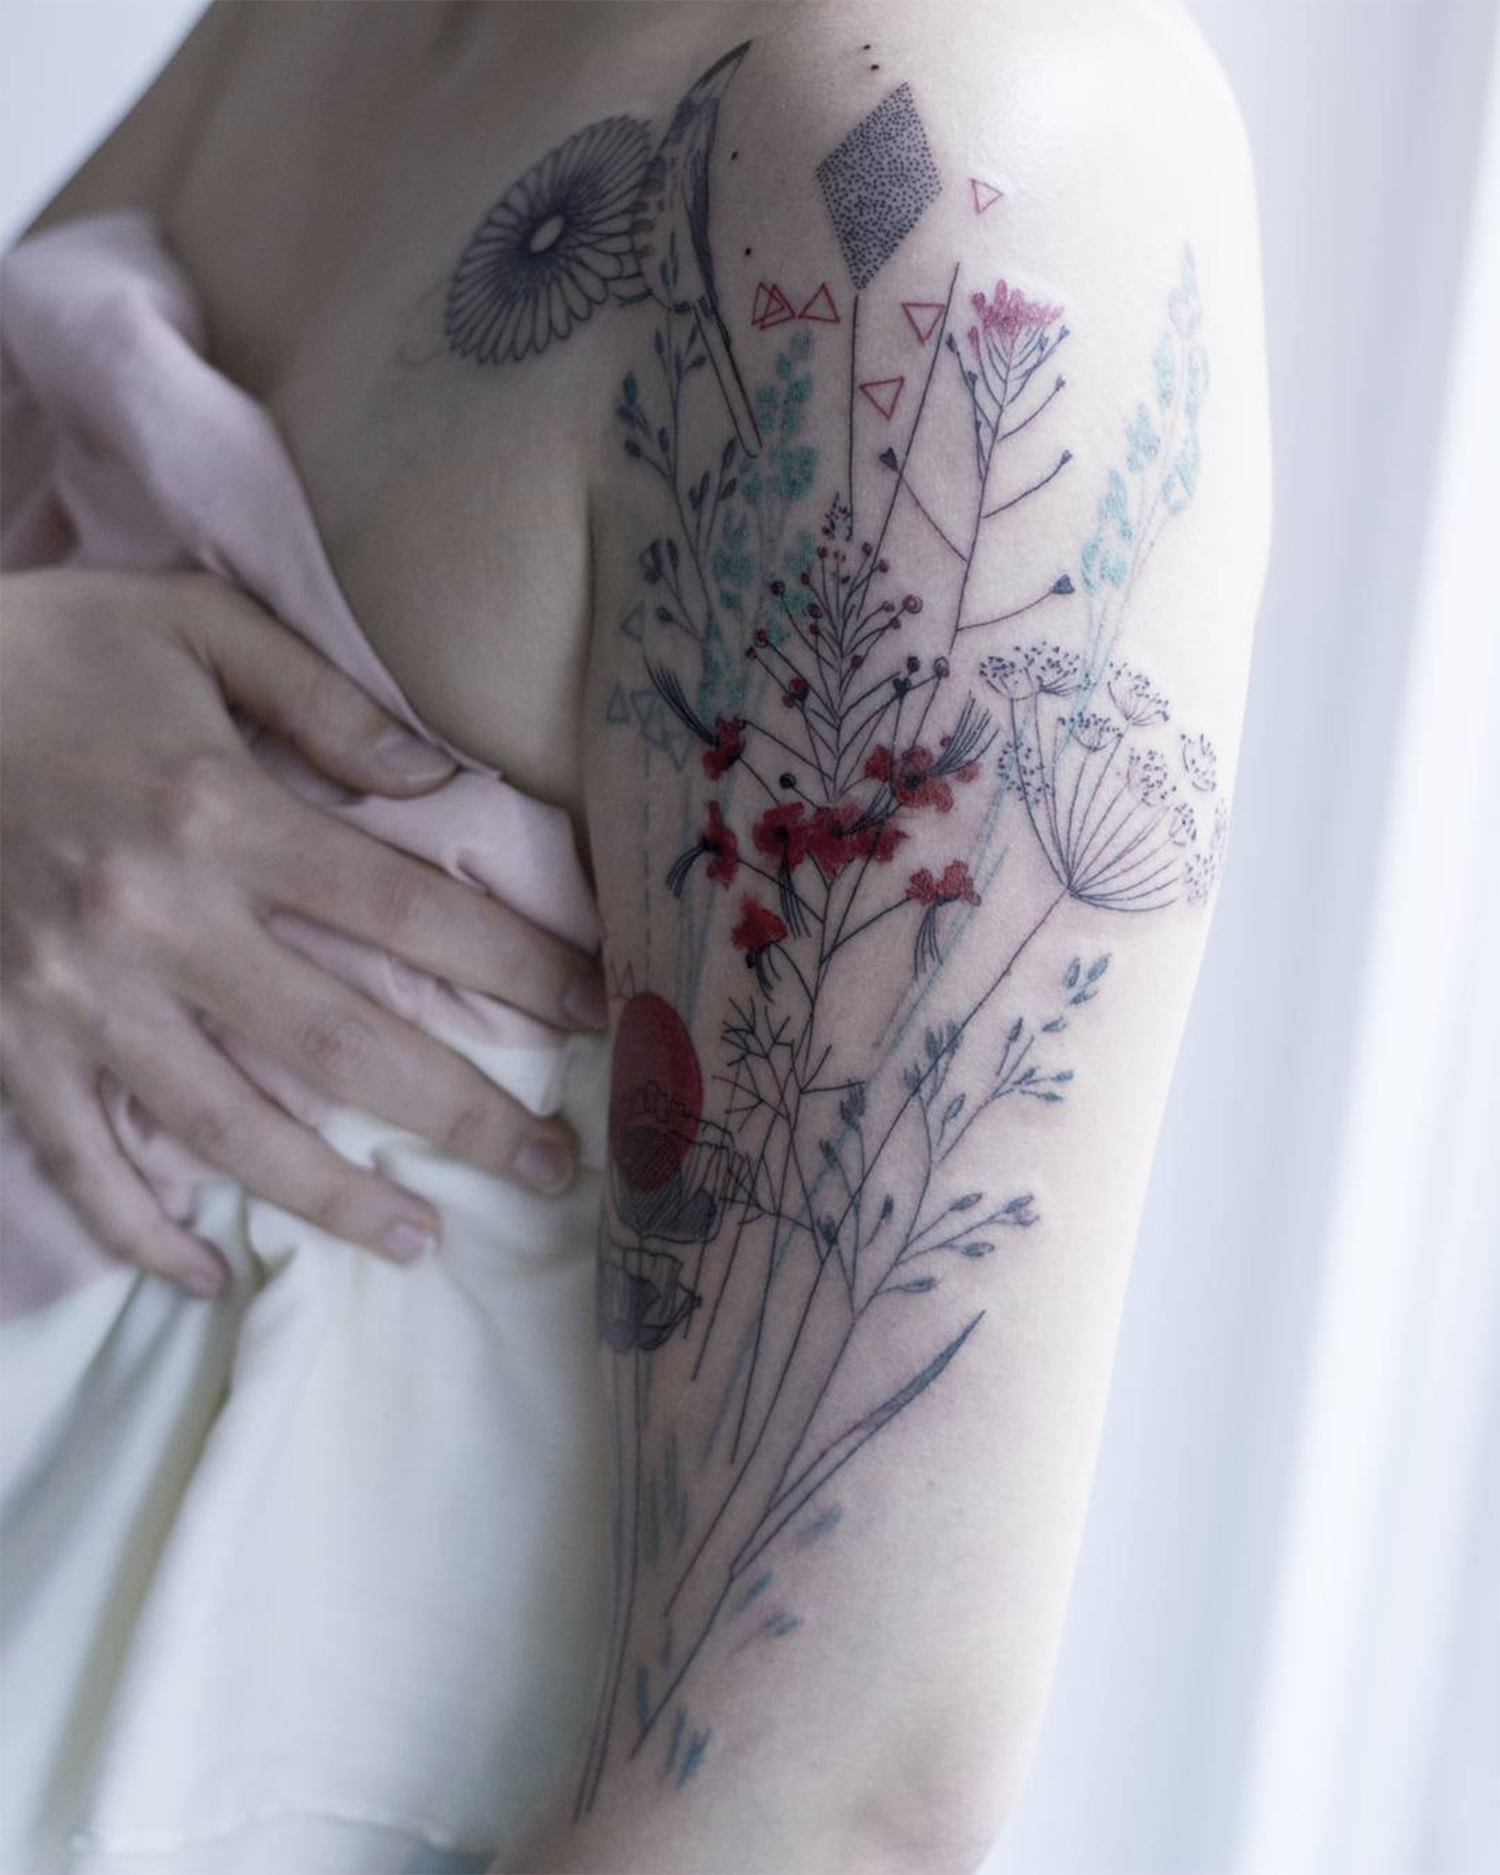 flower tattoo on arm, nature